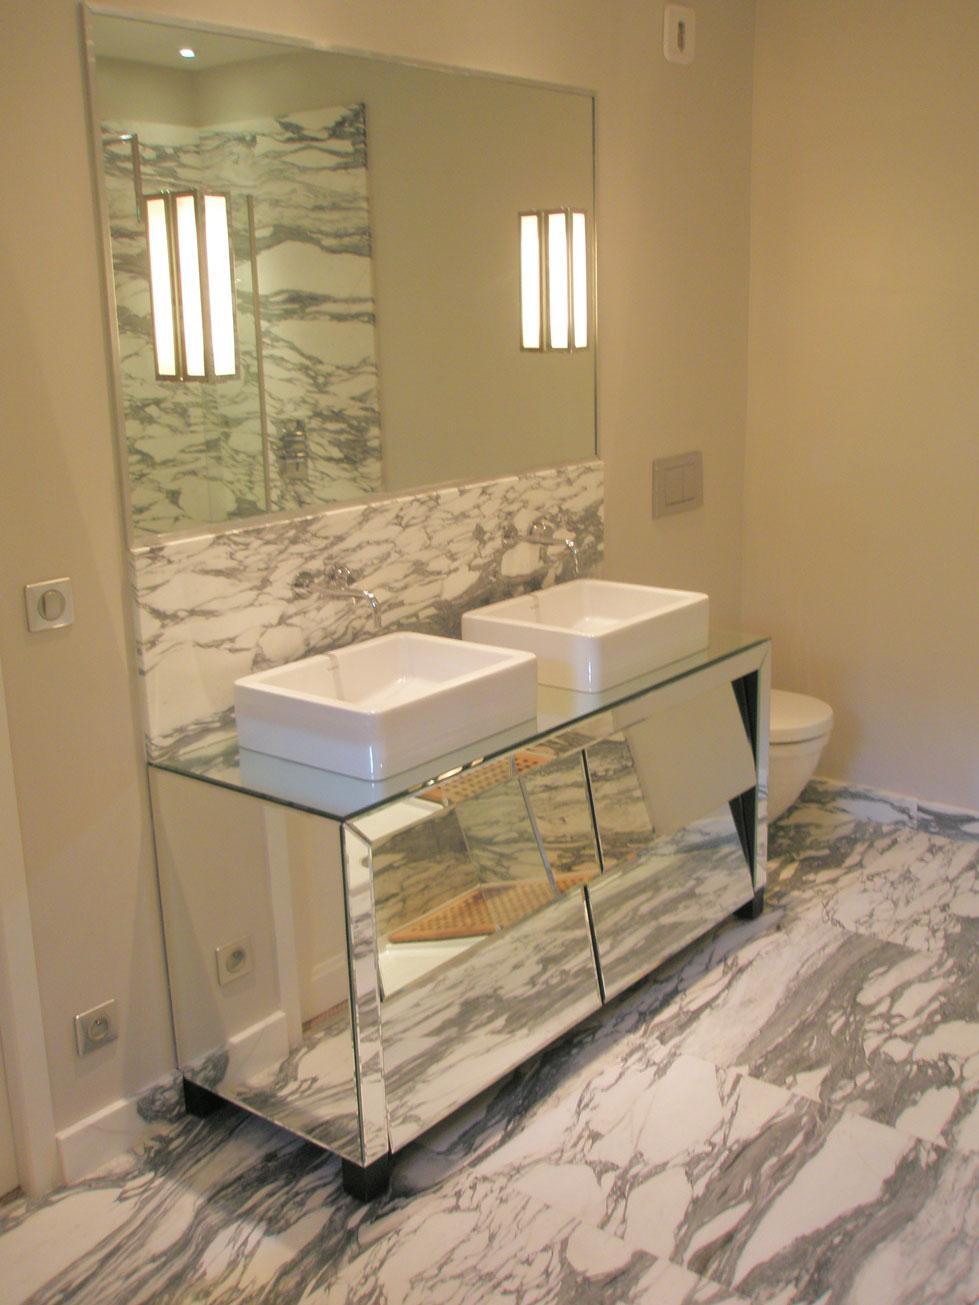 Ванная комната из мрамора Арабескато2